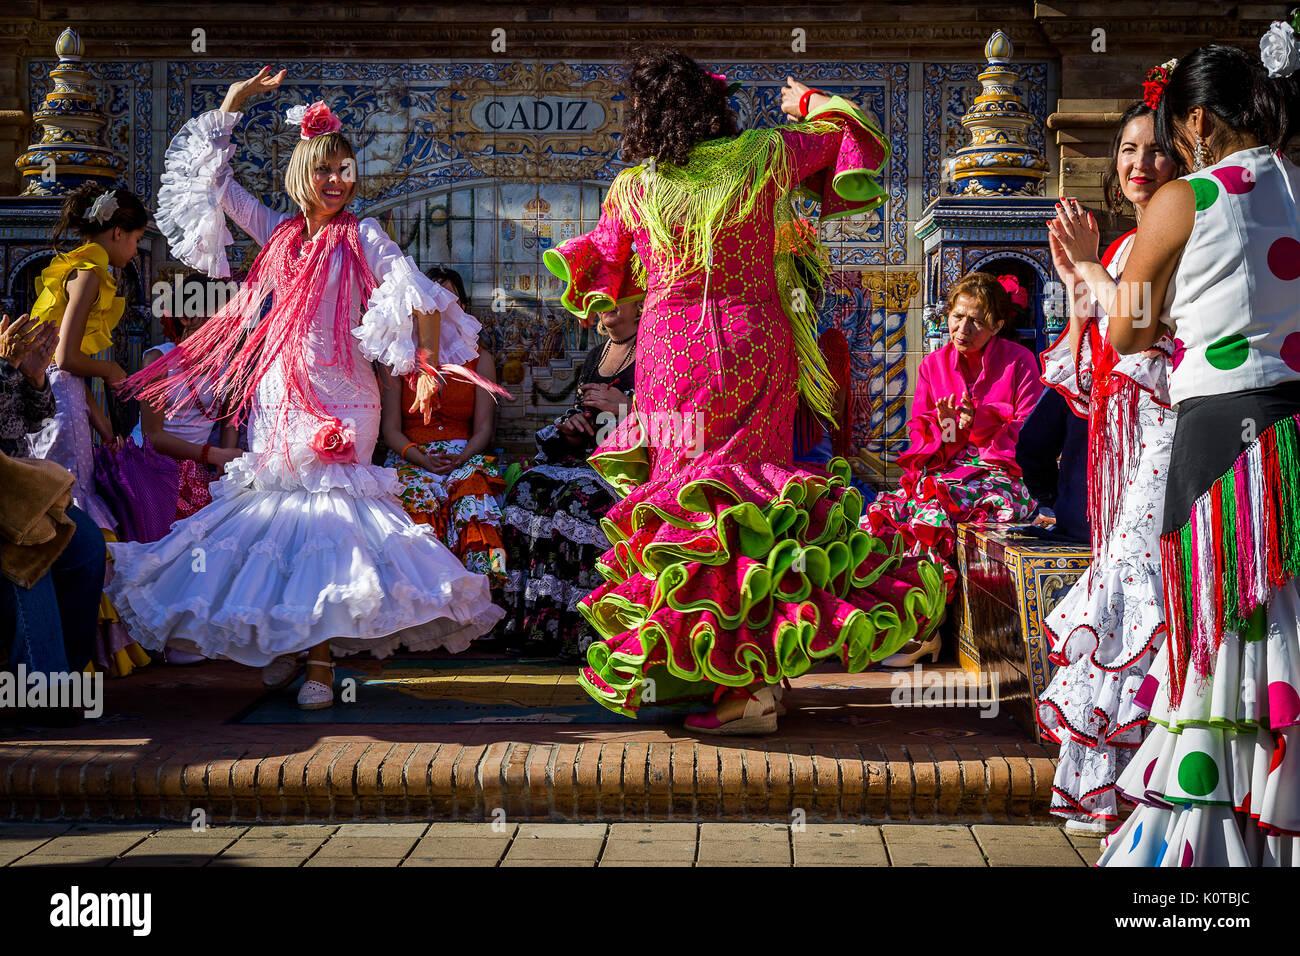 Feria de Abril Imagen De Stock